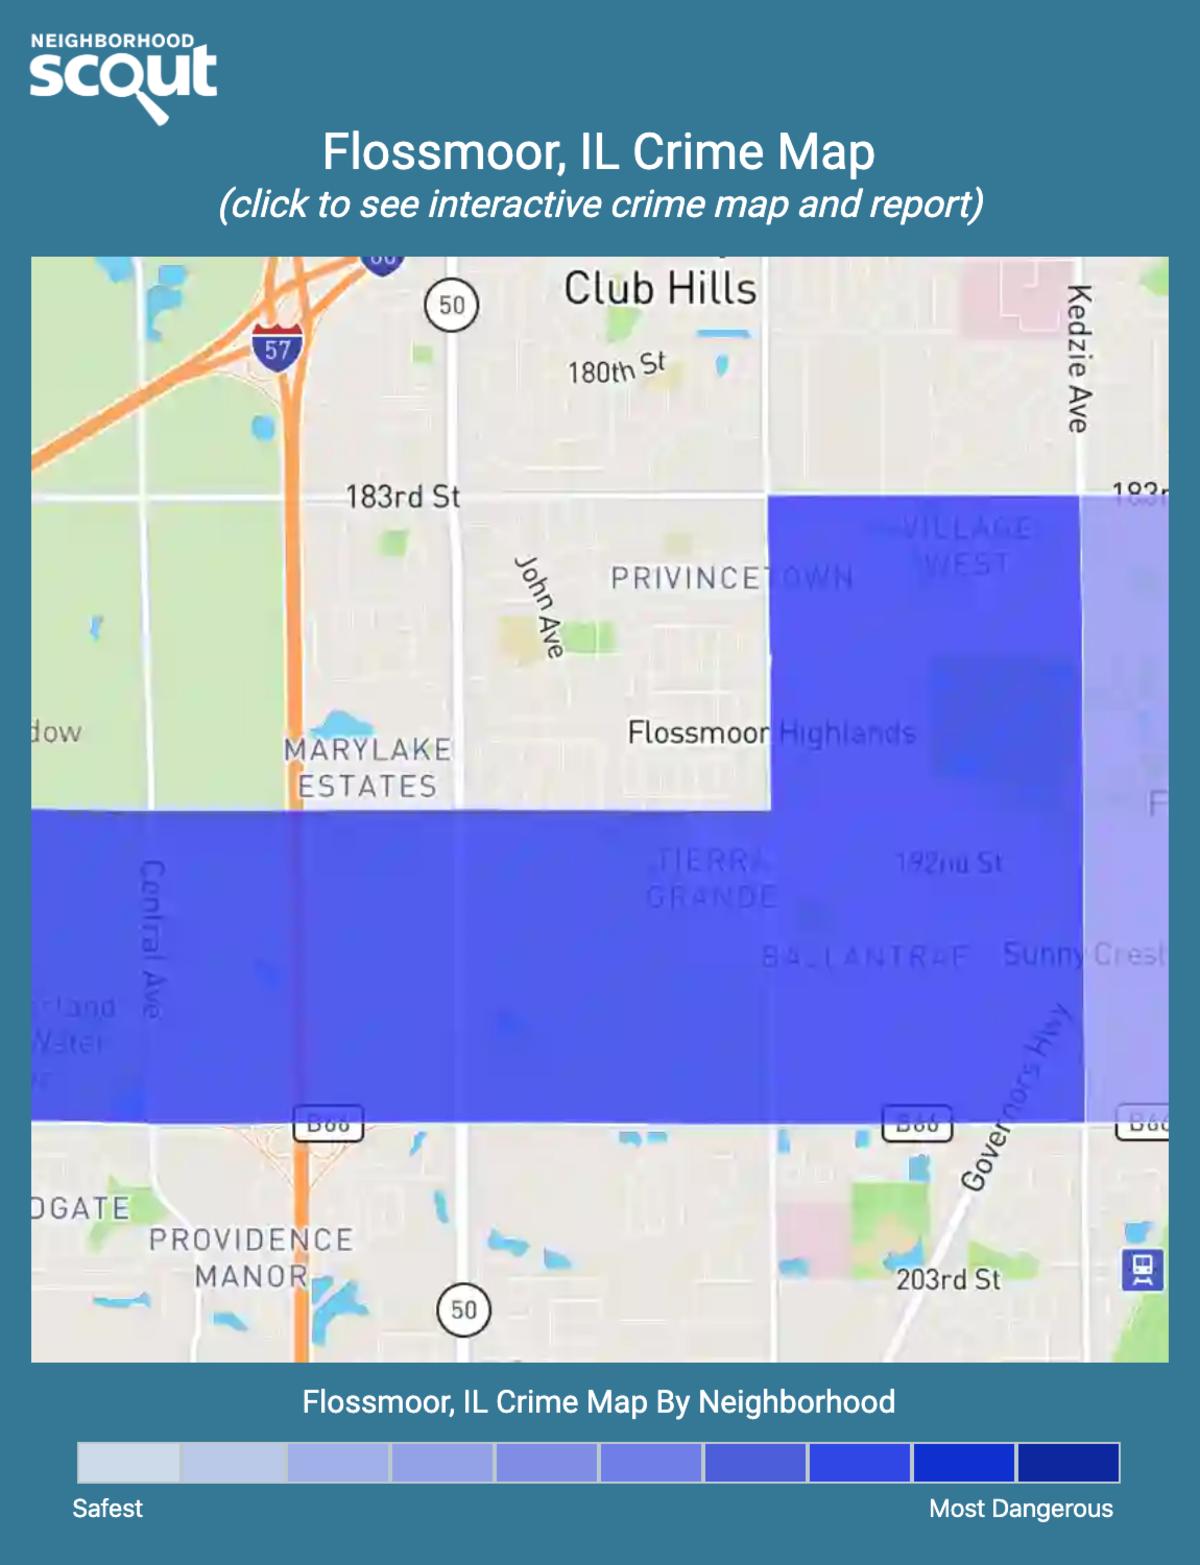 Flossmoor, Illinois crime map